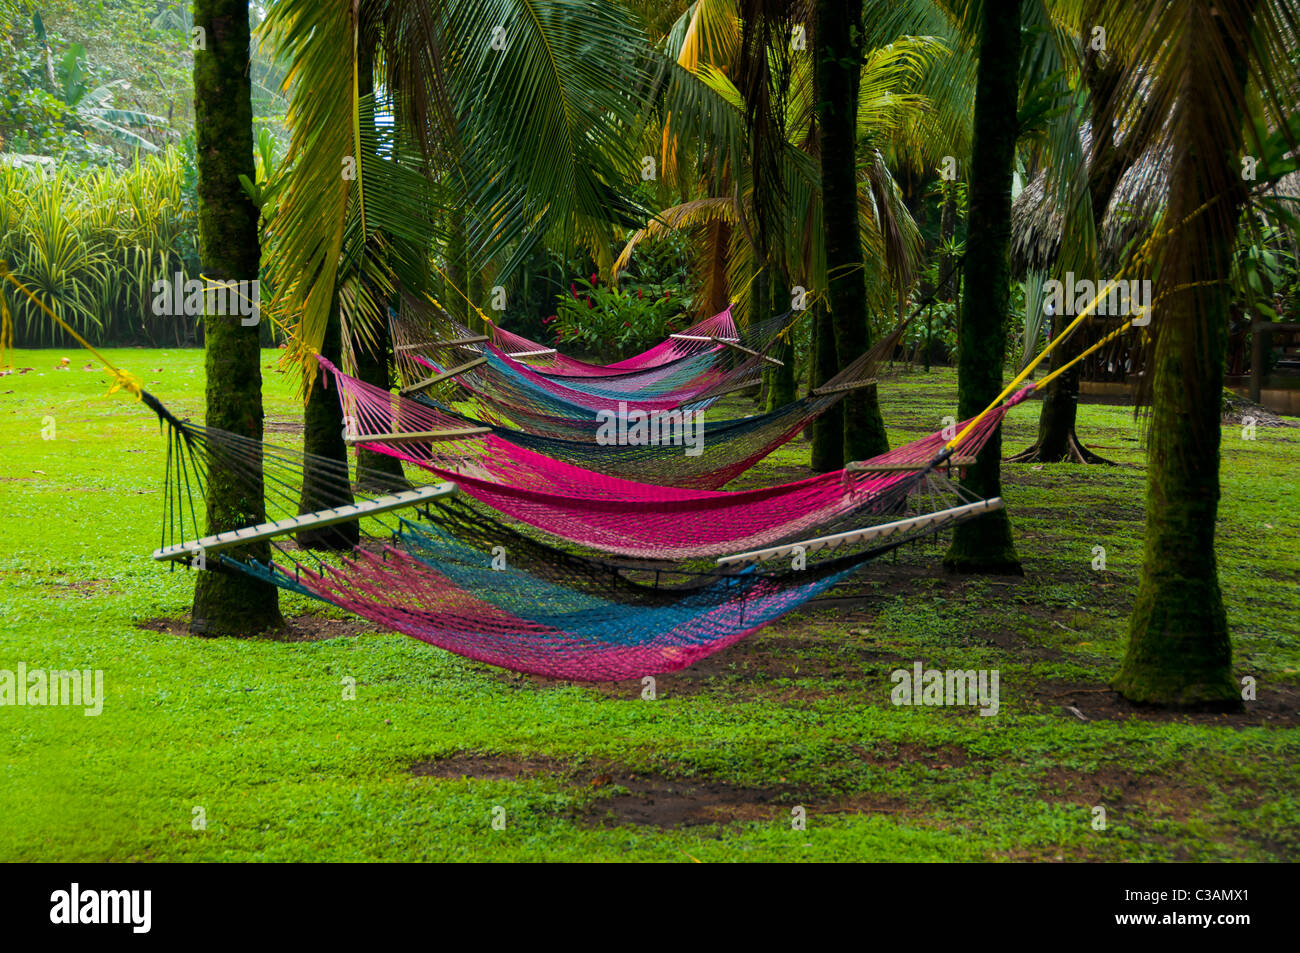 colorful hammocks in peaceful tropical garden colorful hammocks in peaceful tropical garden stock photo royalty      rh   alamy